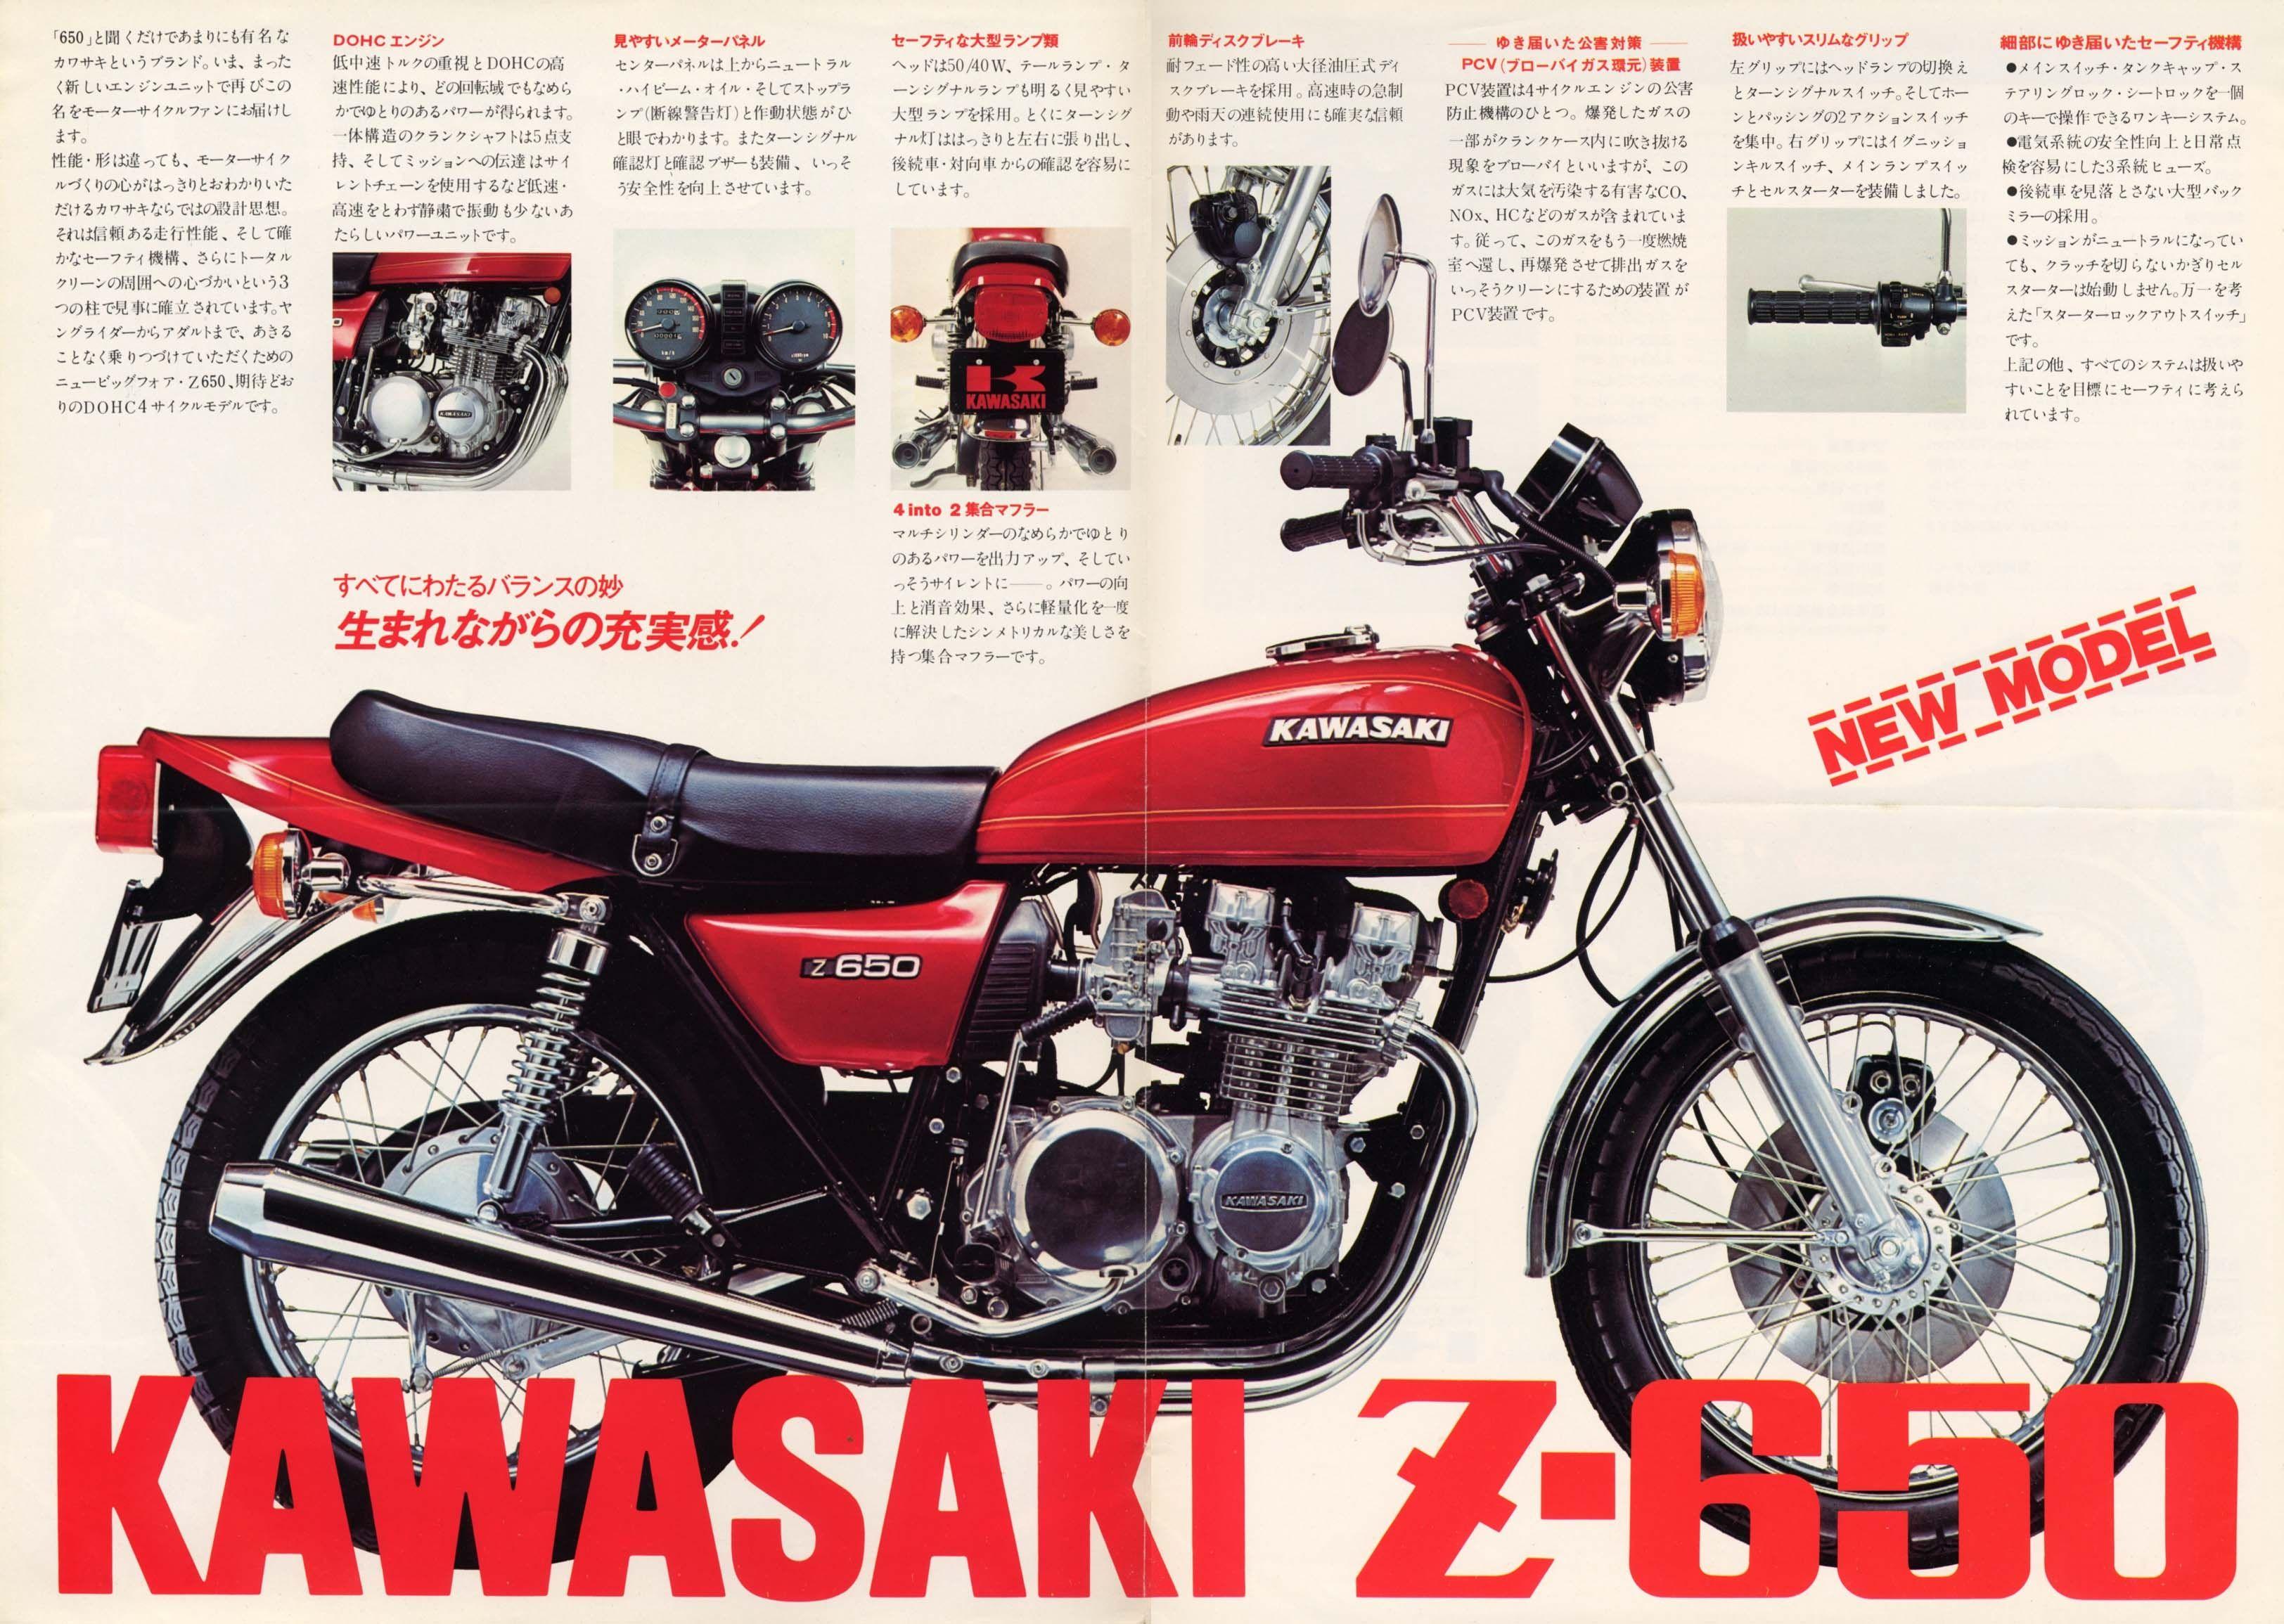 Kz650 Info Classic Motorcycles Kawasaki Motorcycle Posters